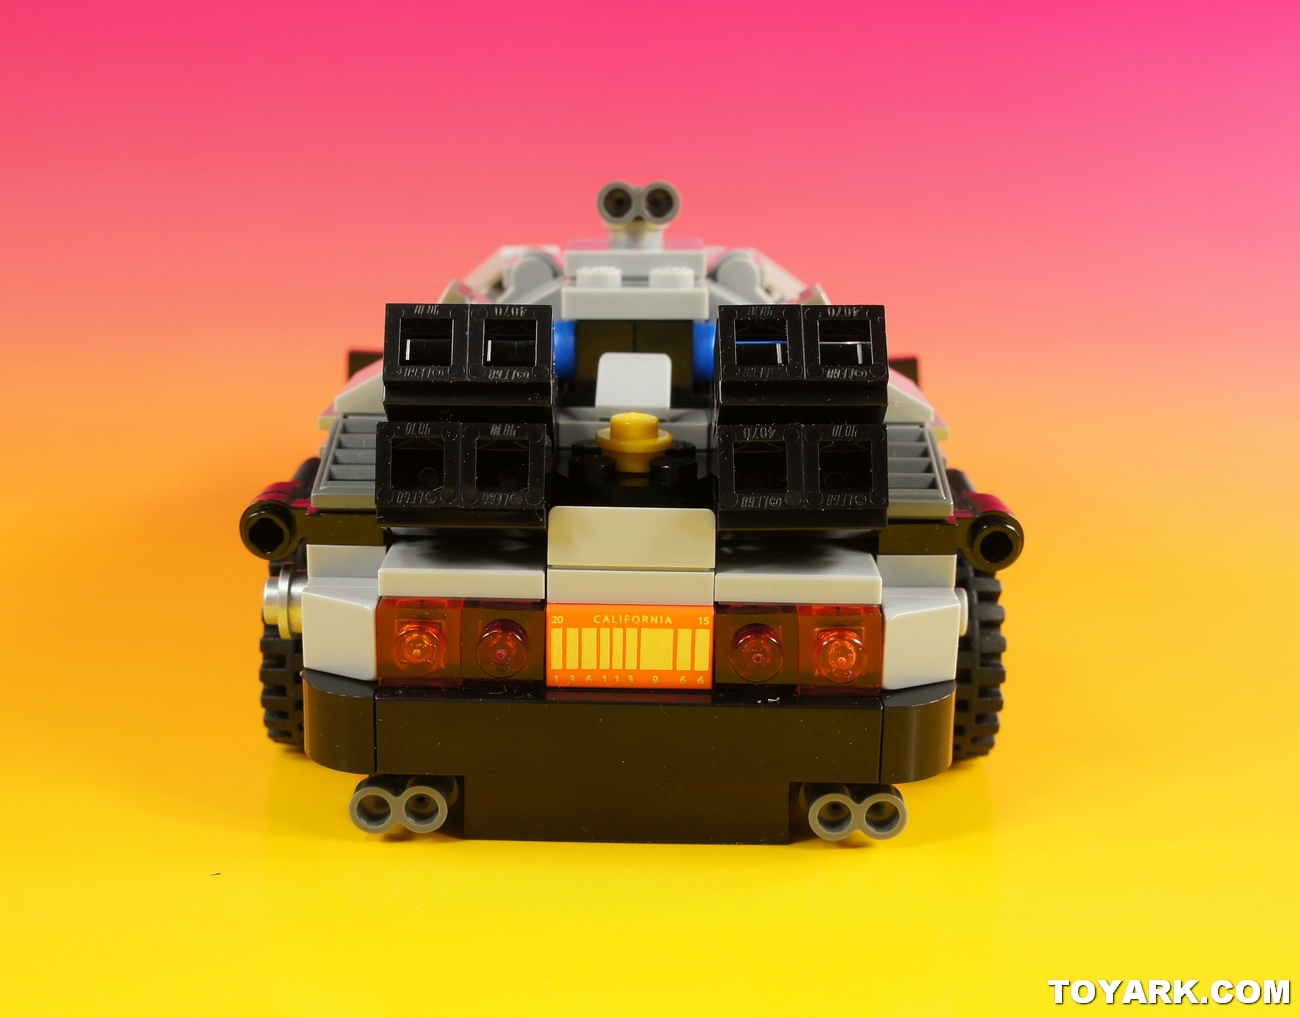 Lego Cuusoo Back To The Future 21103 Photo Shoot The